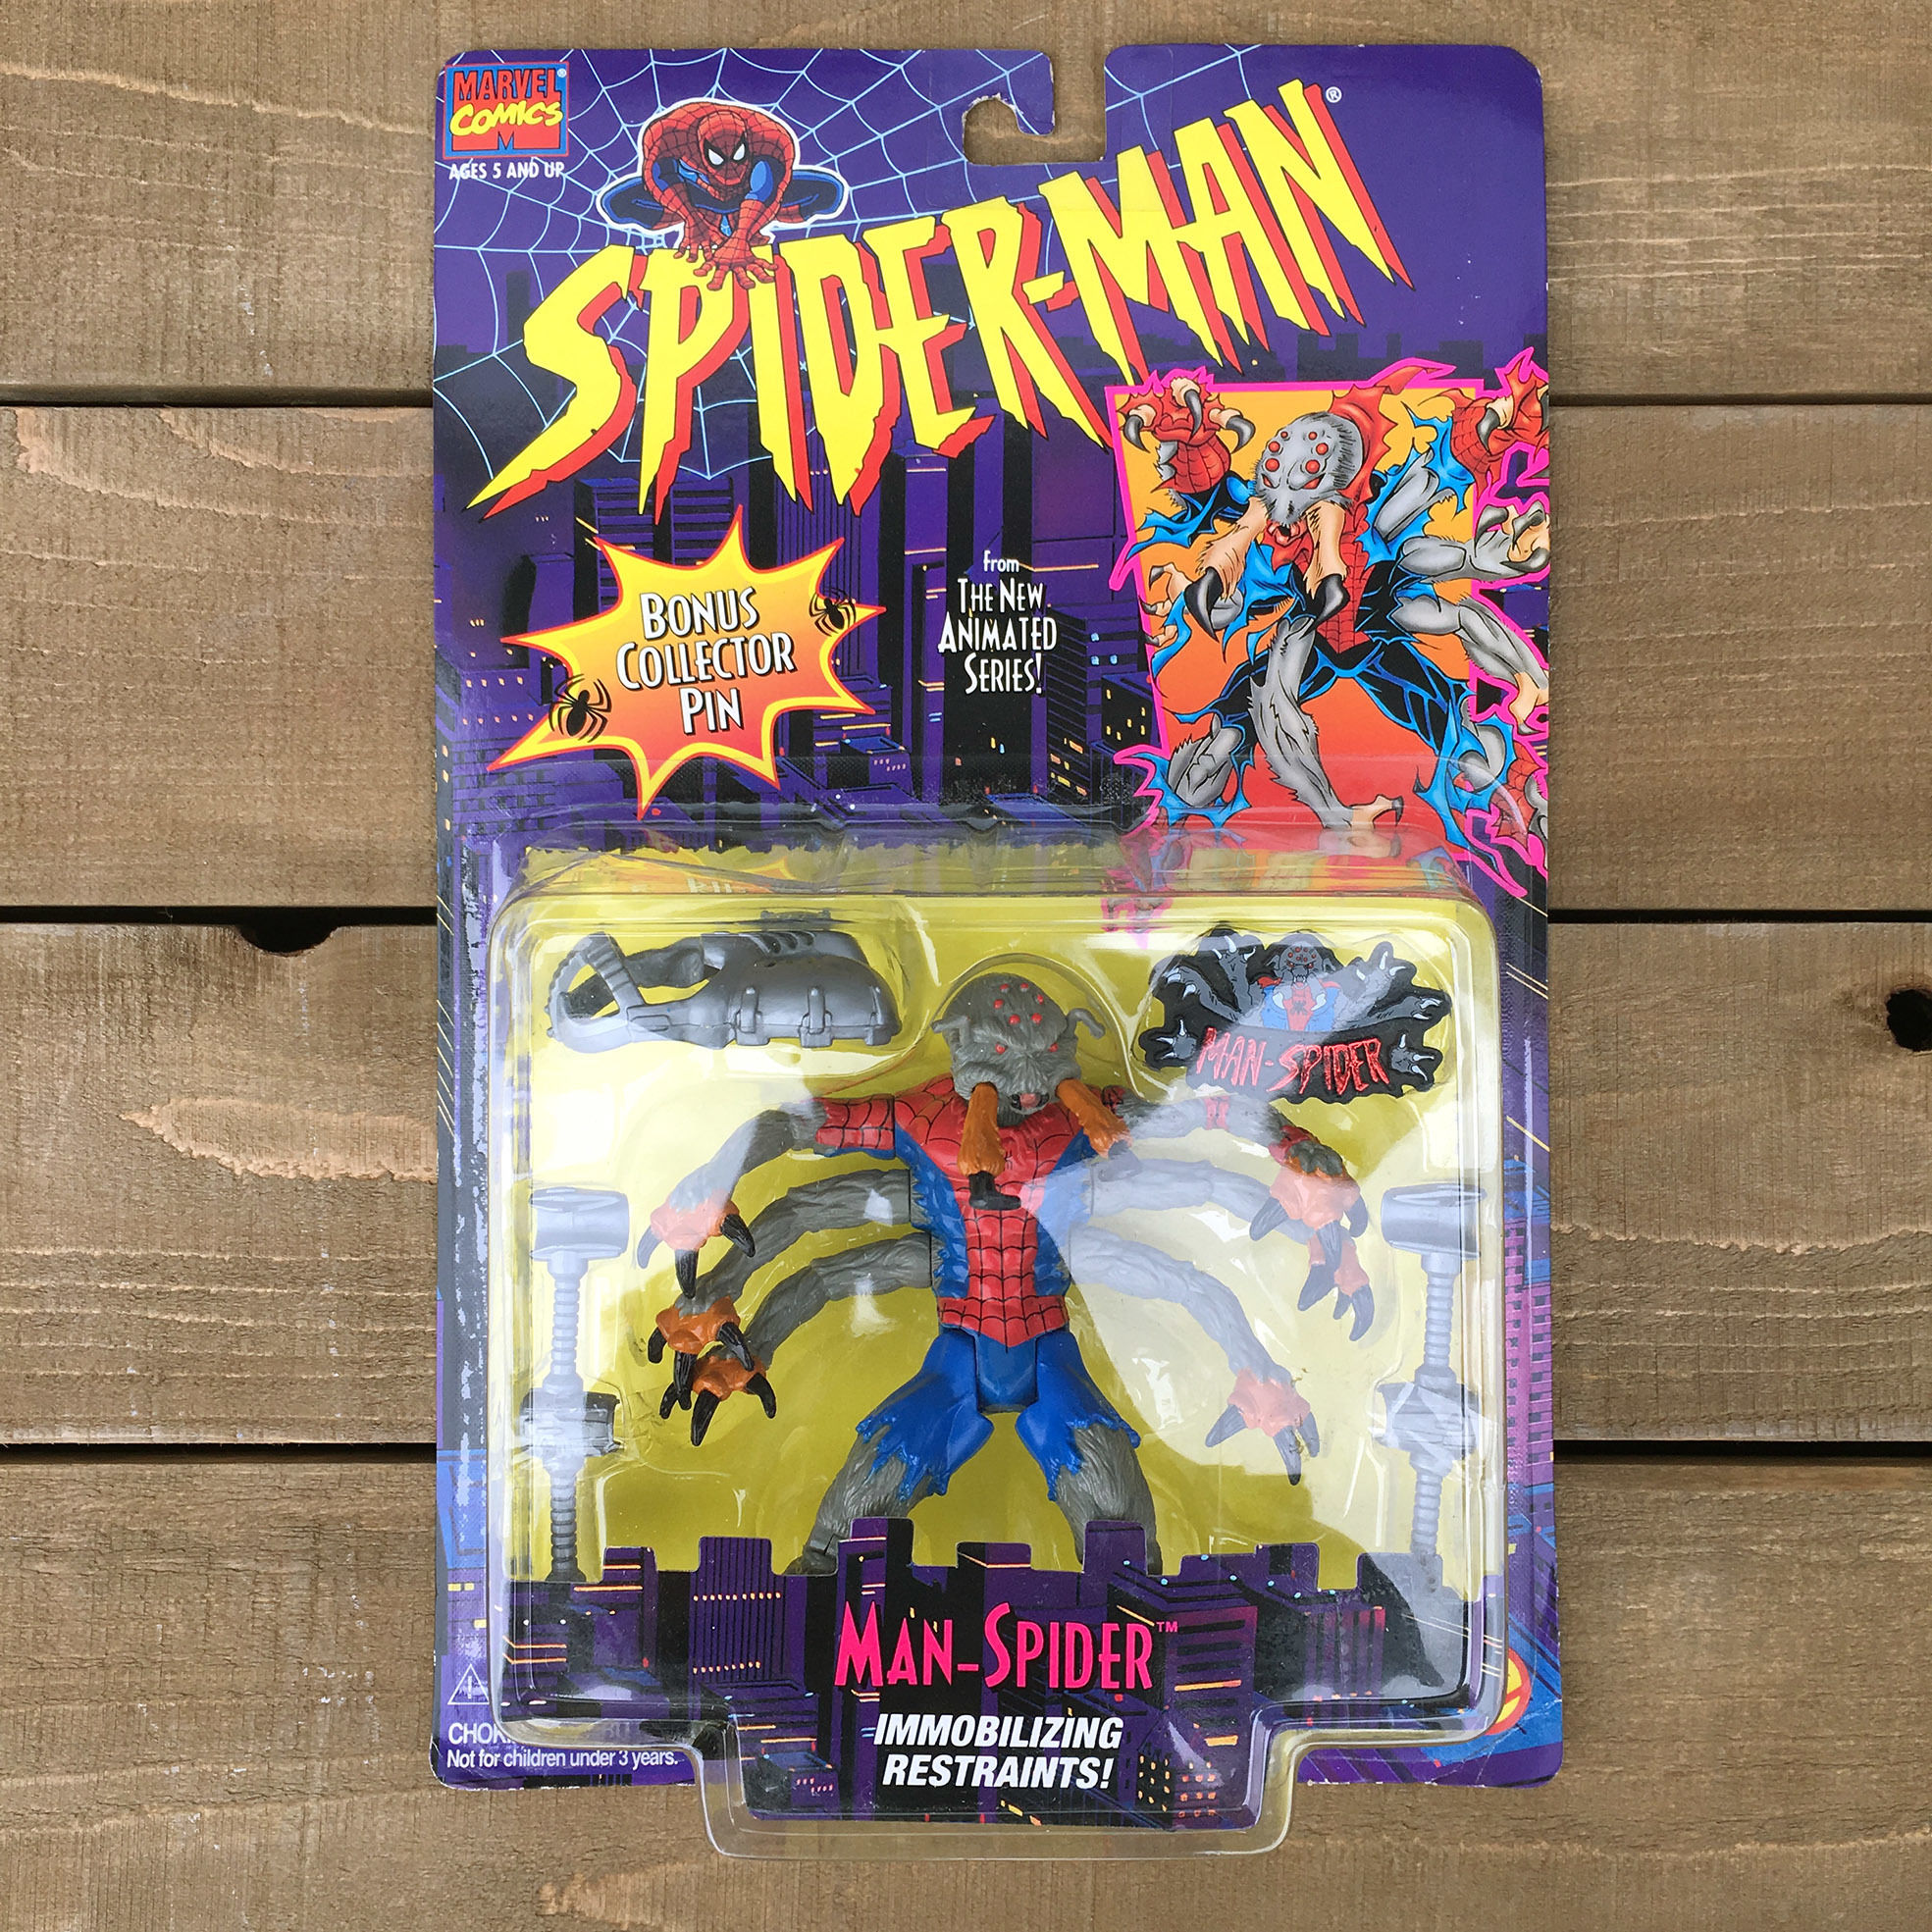 SPIDER-MAN Man-Spider/スパイダーマン マンスパイダー フィギュア/1700307-20